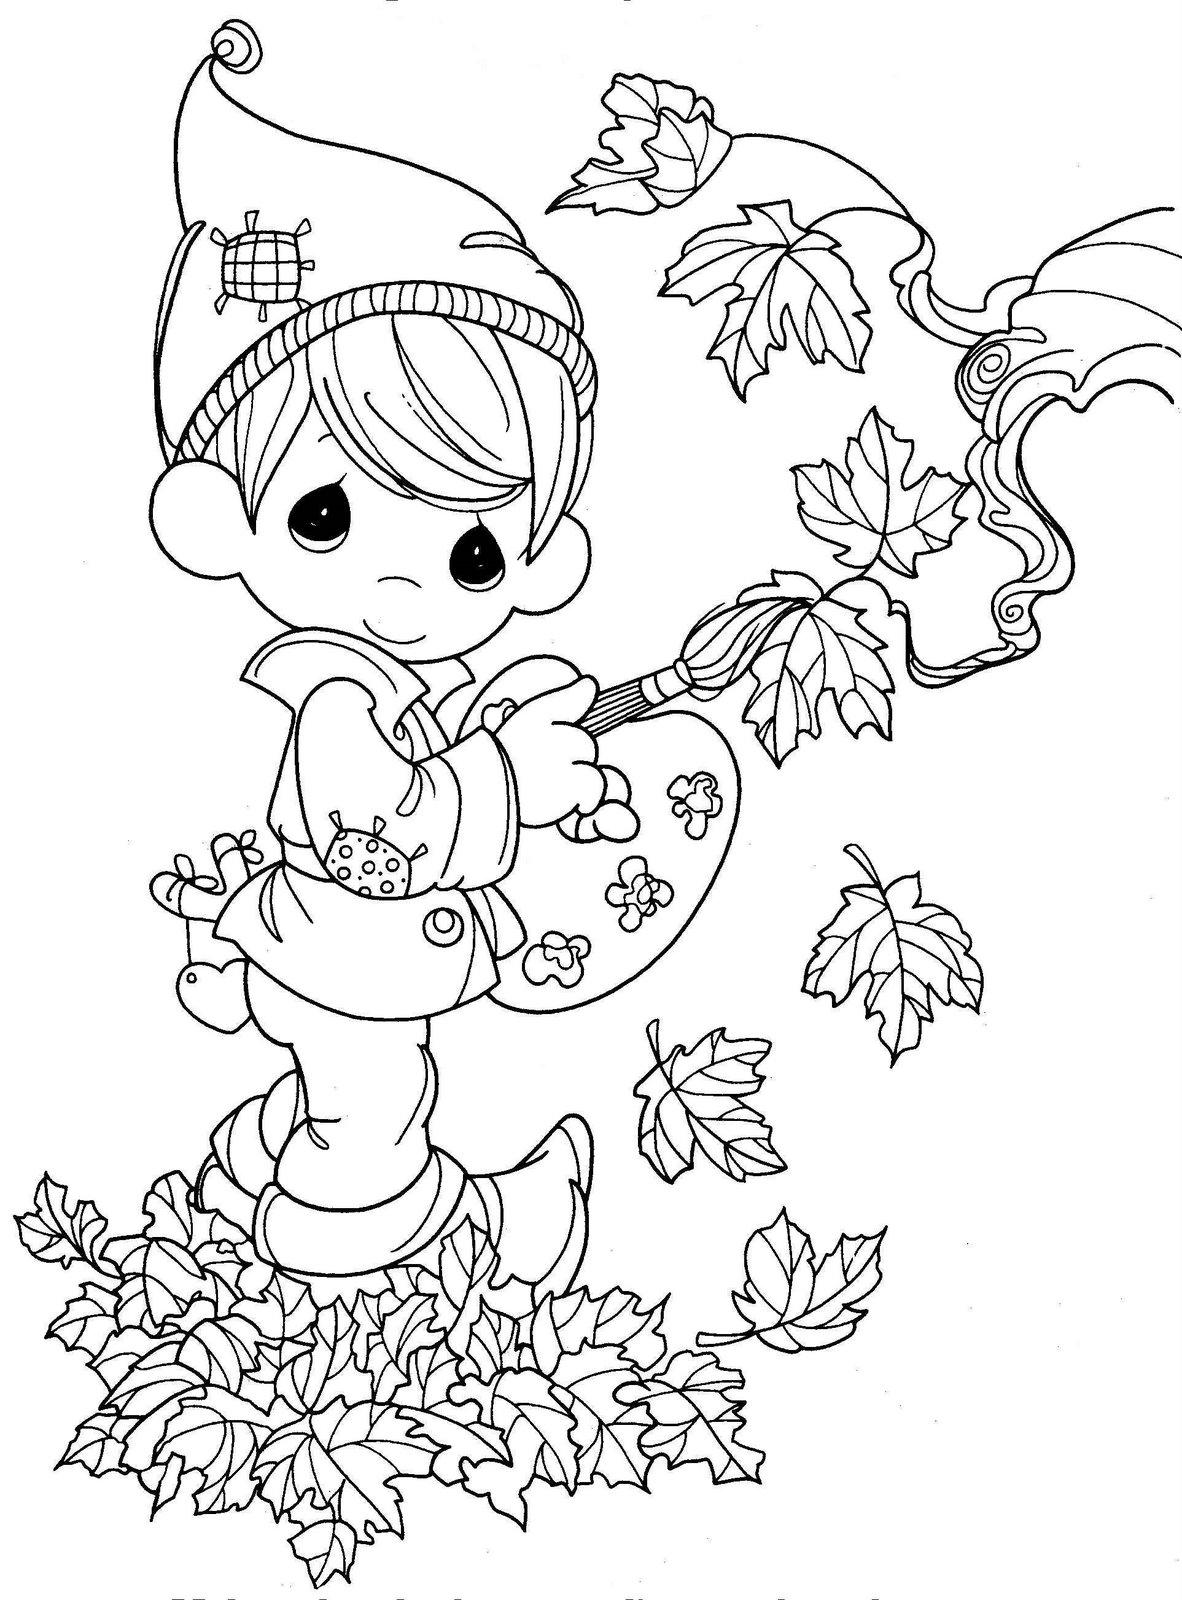 fall coloring sheets printable free printable fall coloring pages for kids best fall sheets printable coloring 1 1